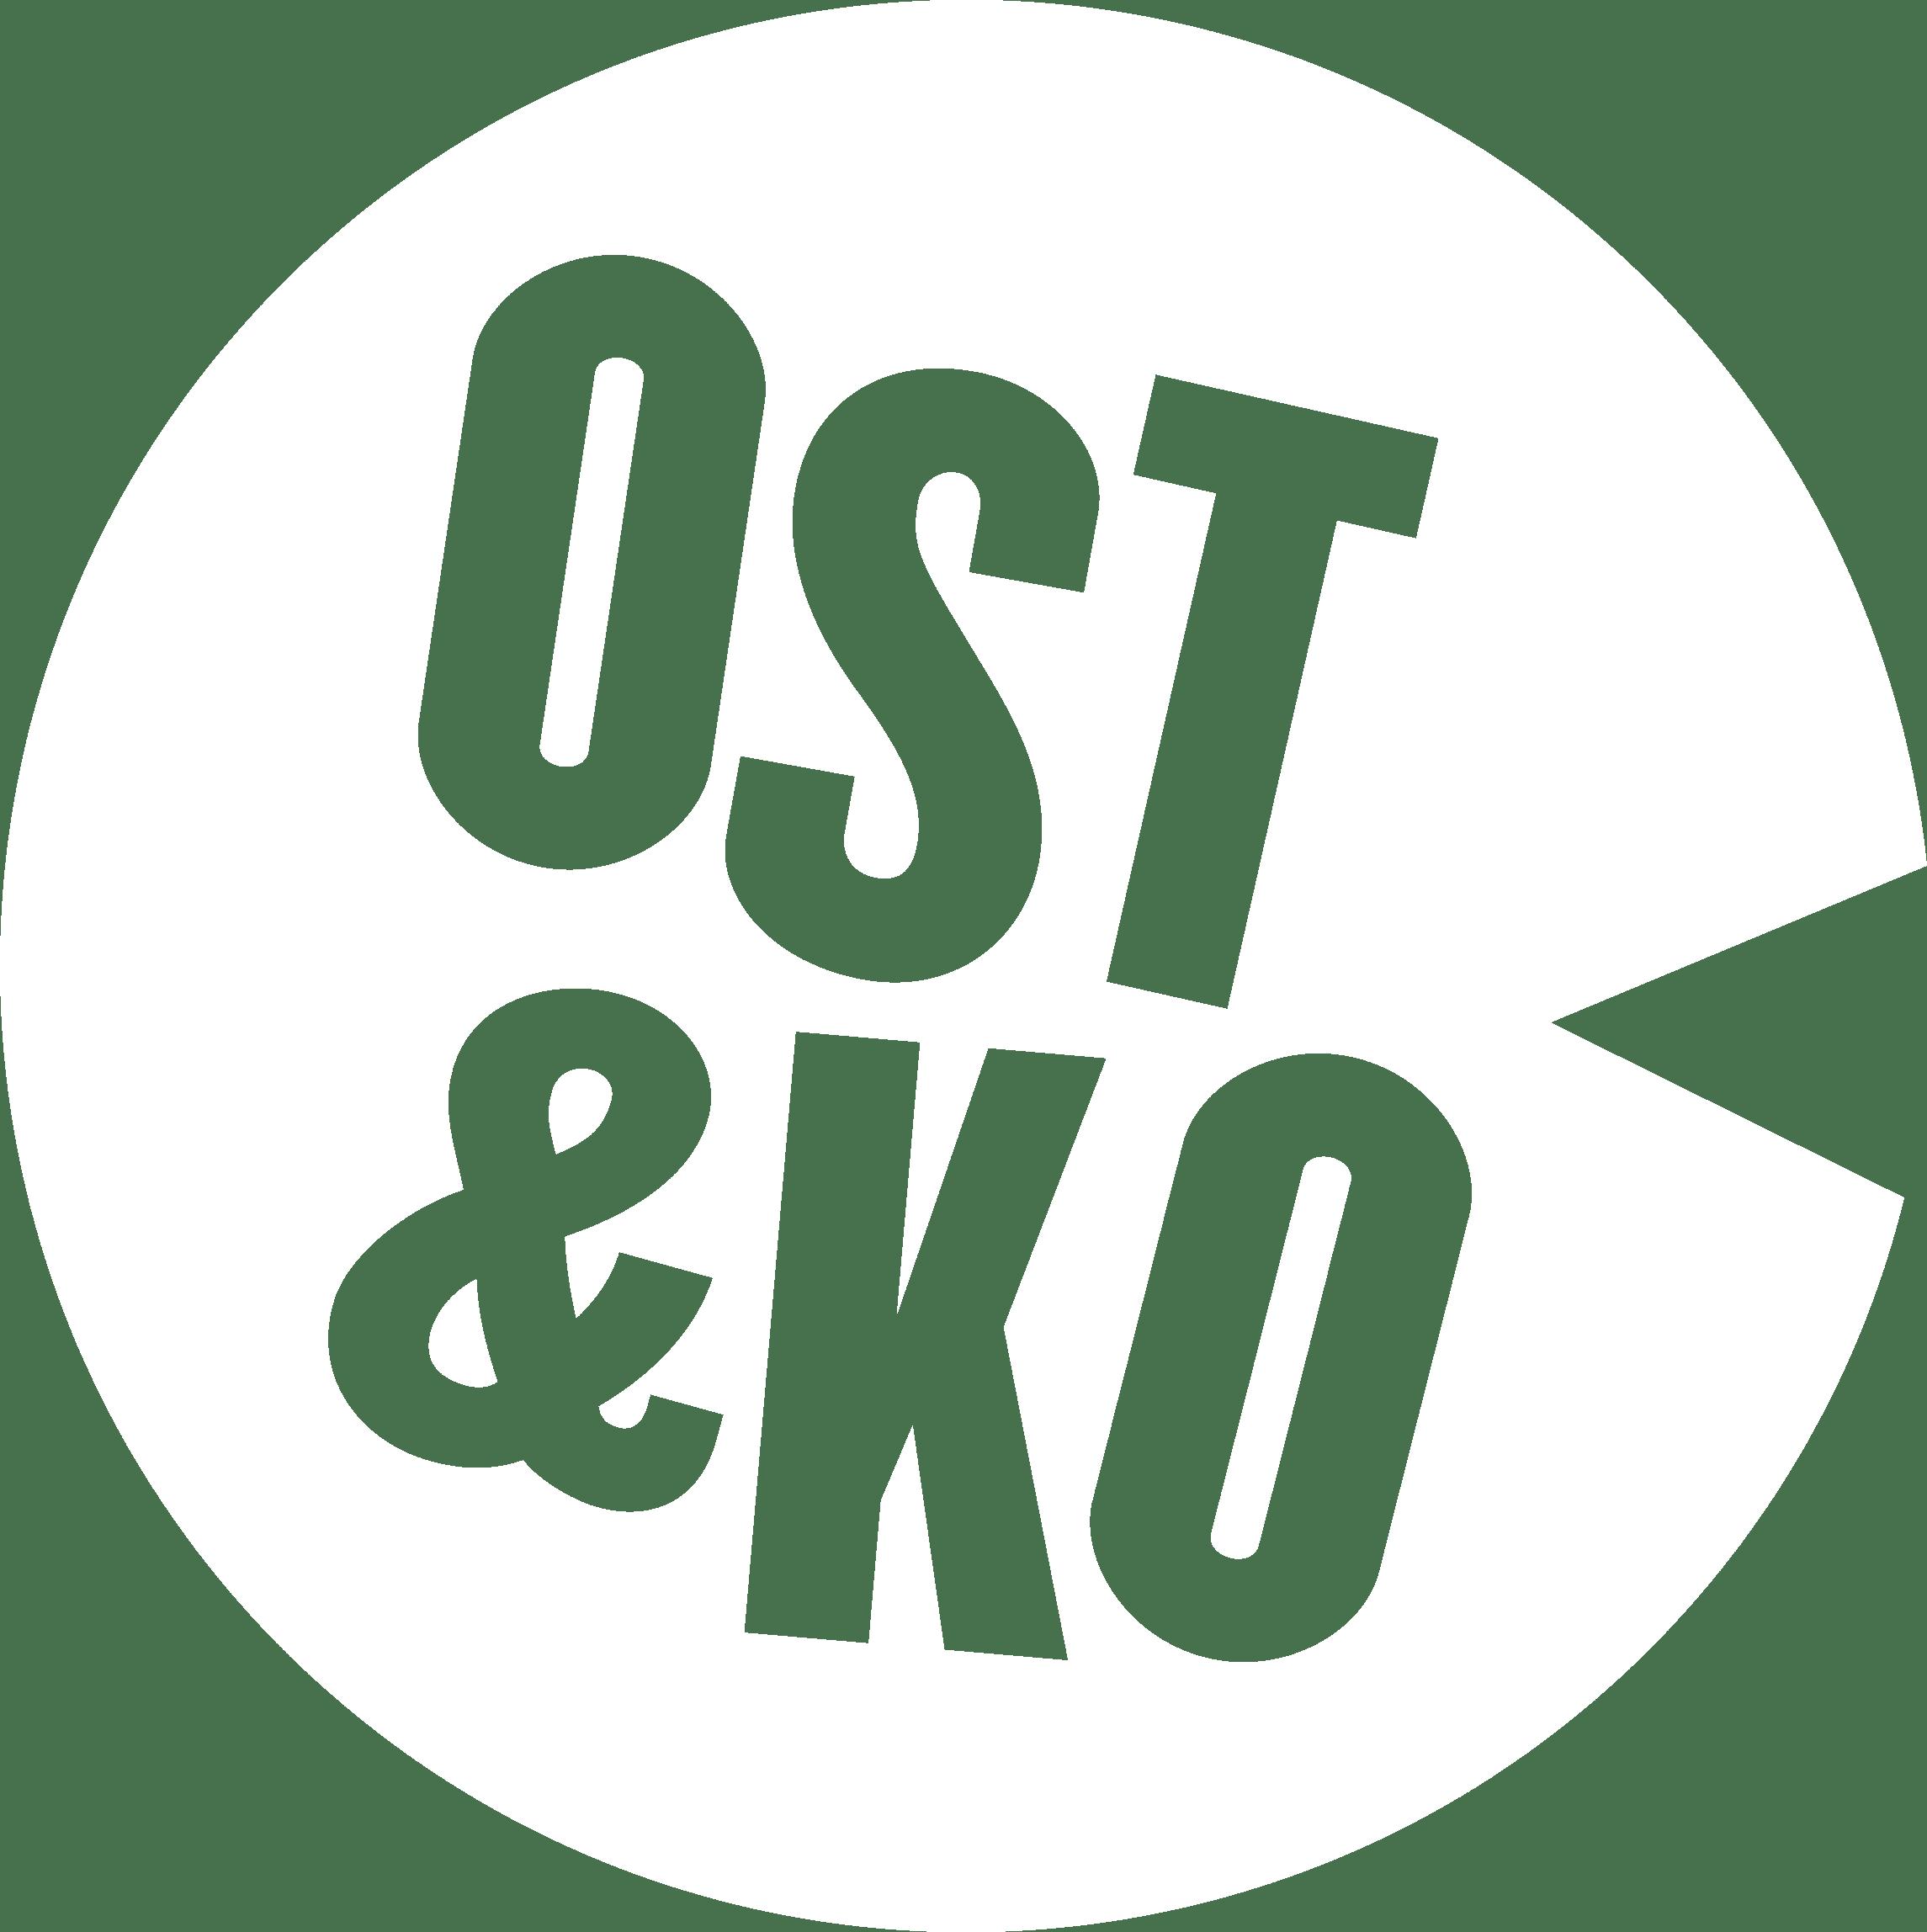 Ost & ko